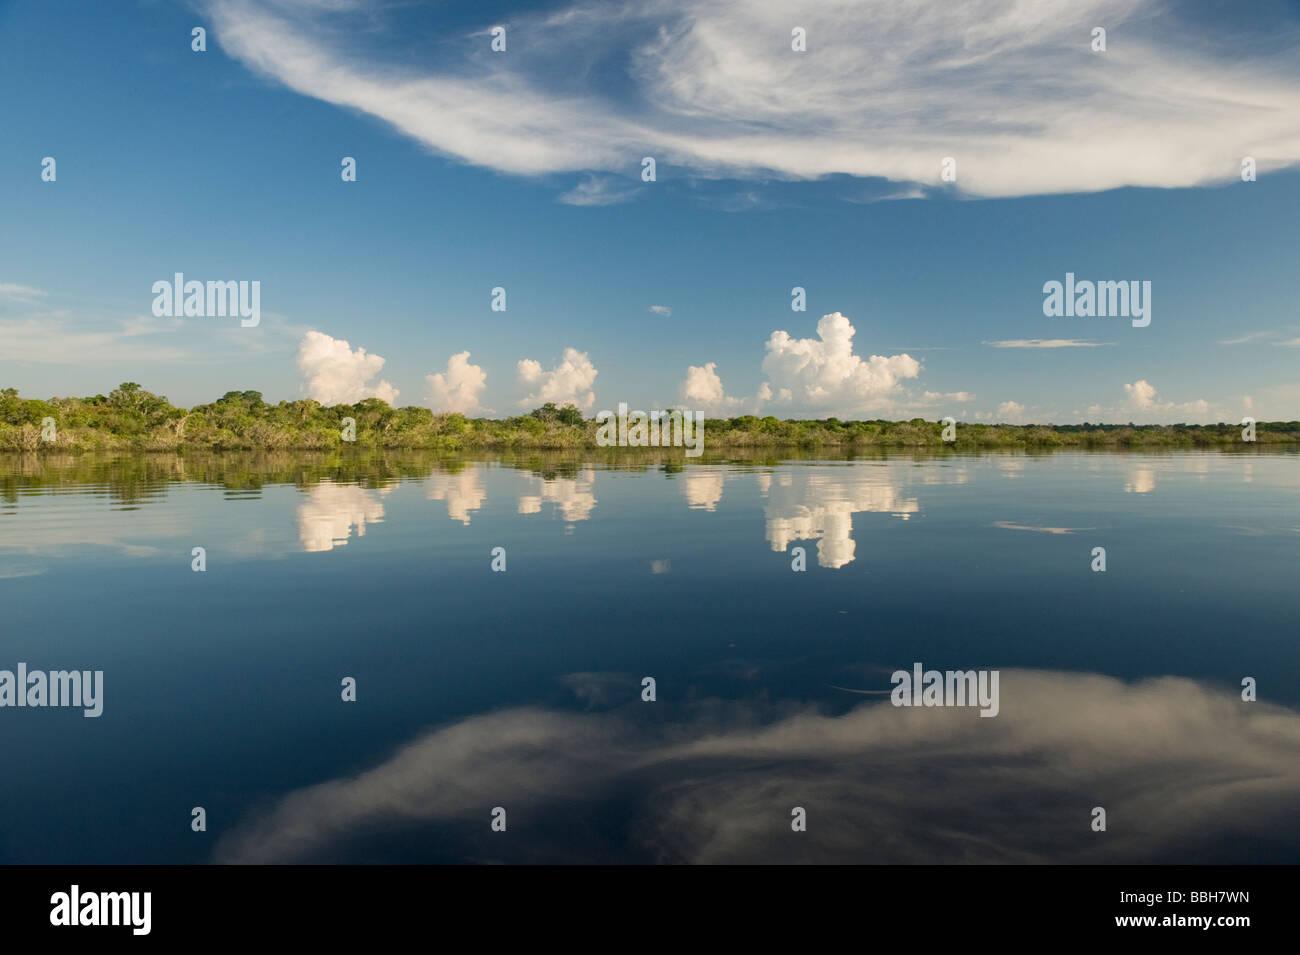 Rio Negro reflection, Amazon region near Manaus, Brazil - Stock Image